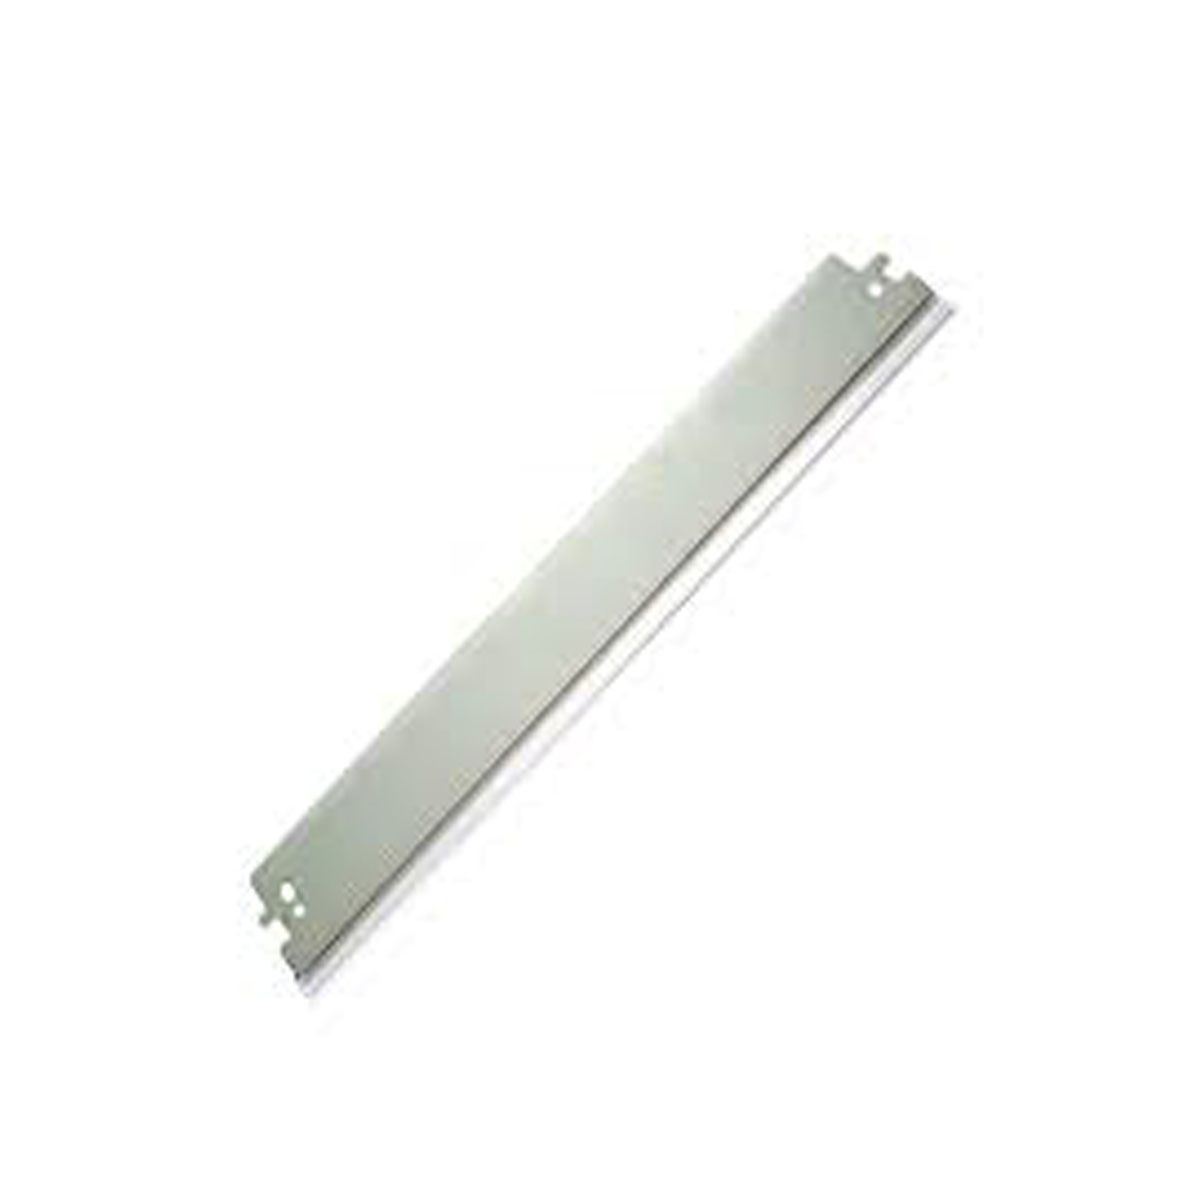 Lamina Limpeza Wiper Blade HP Q2612 2612 12A CF226 226 - 1018 1020 M1005 M426